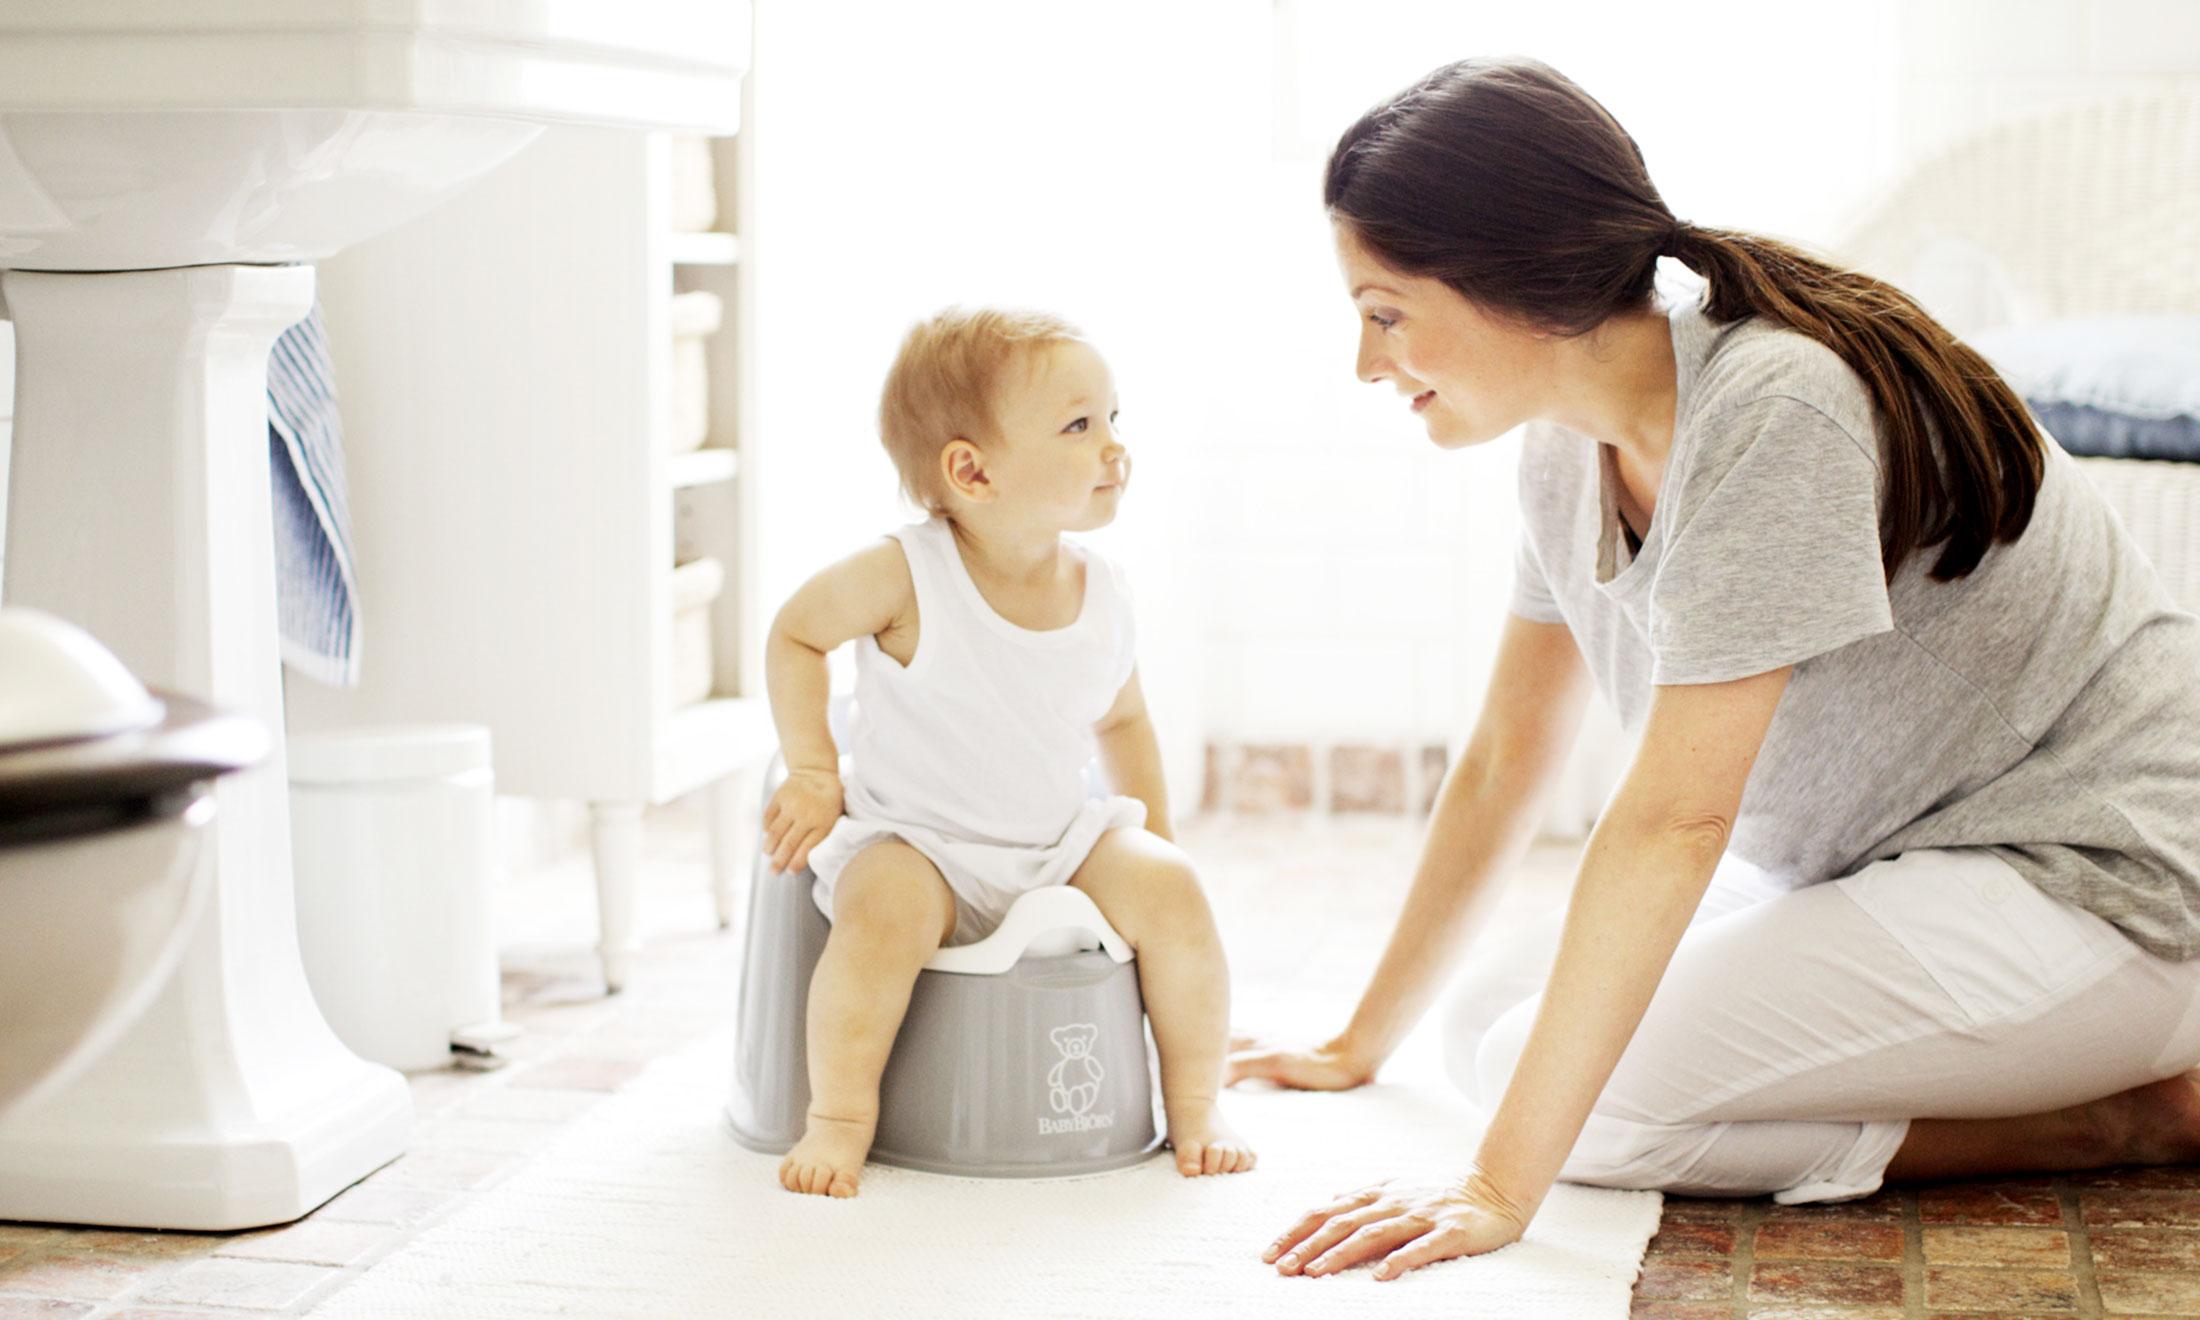 Kak_priuchit_rebenka_k_gorshku, ребенок и горшок, приучение ребенка к горшку